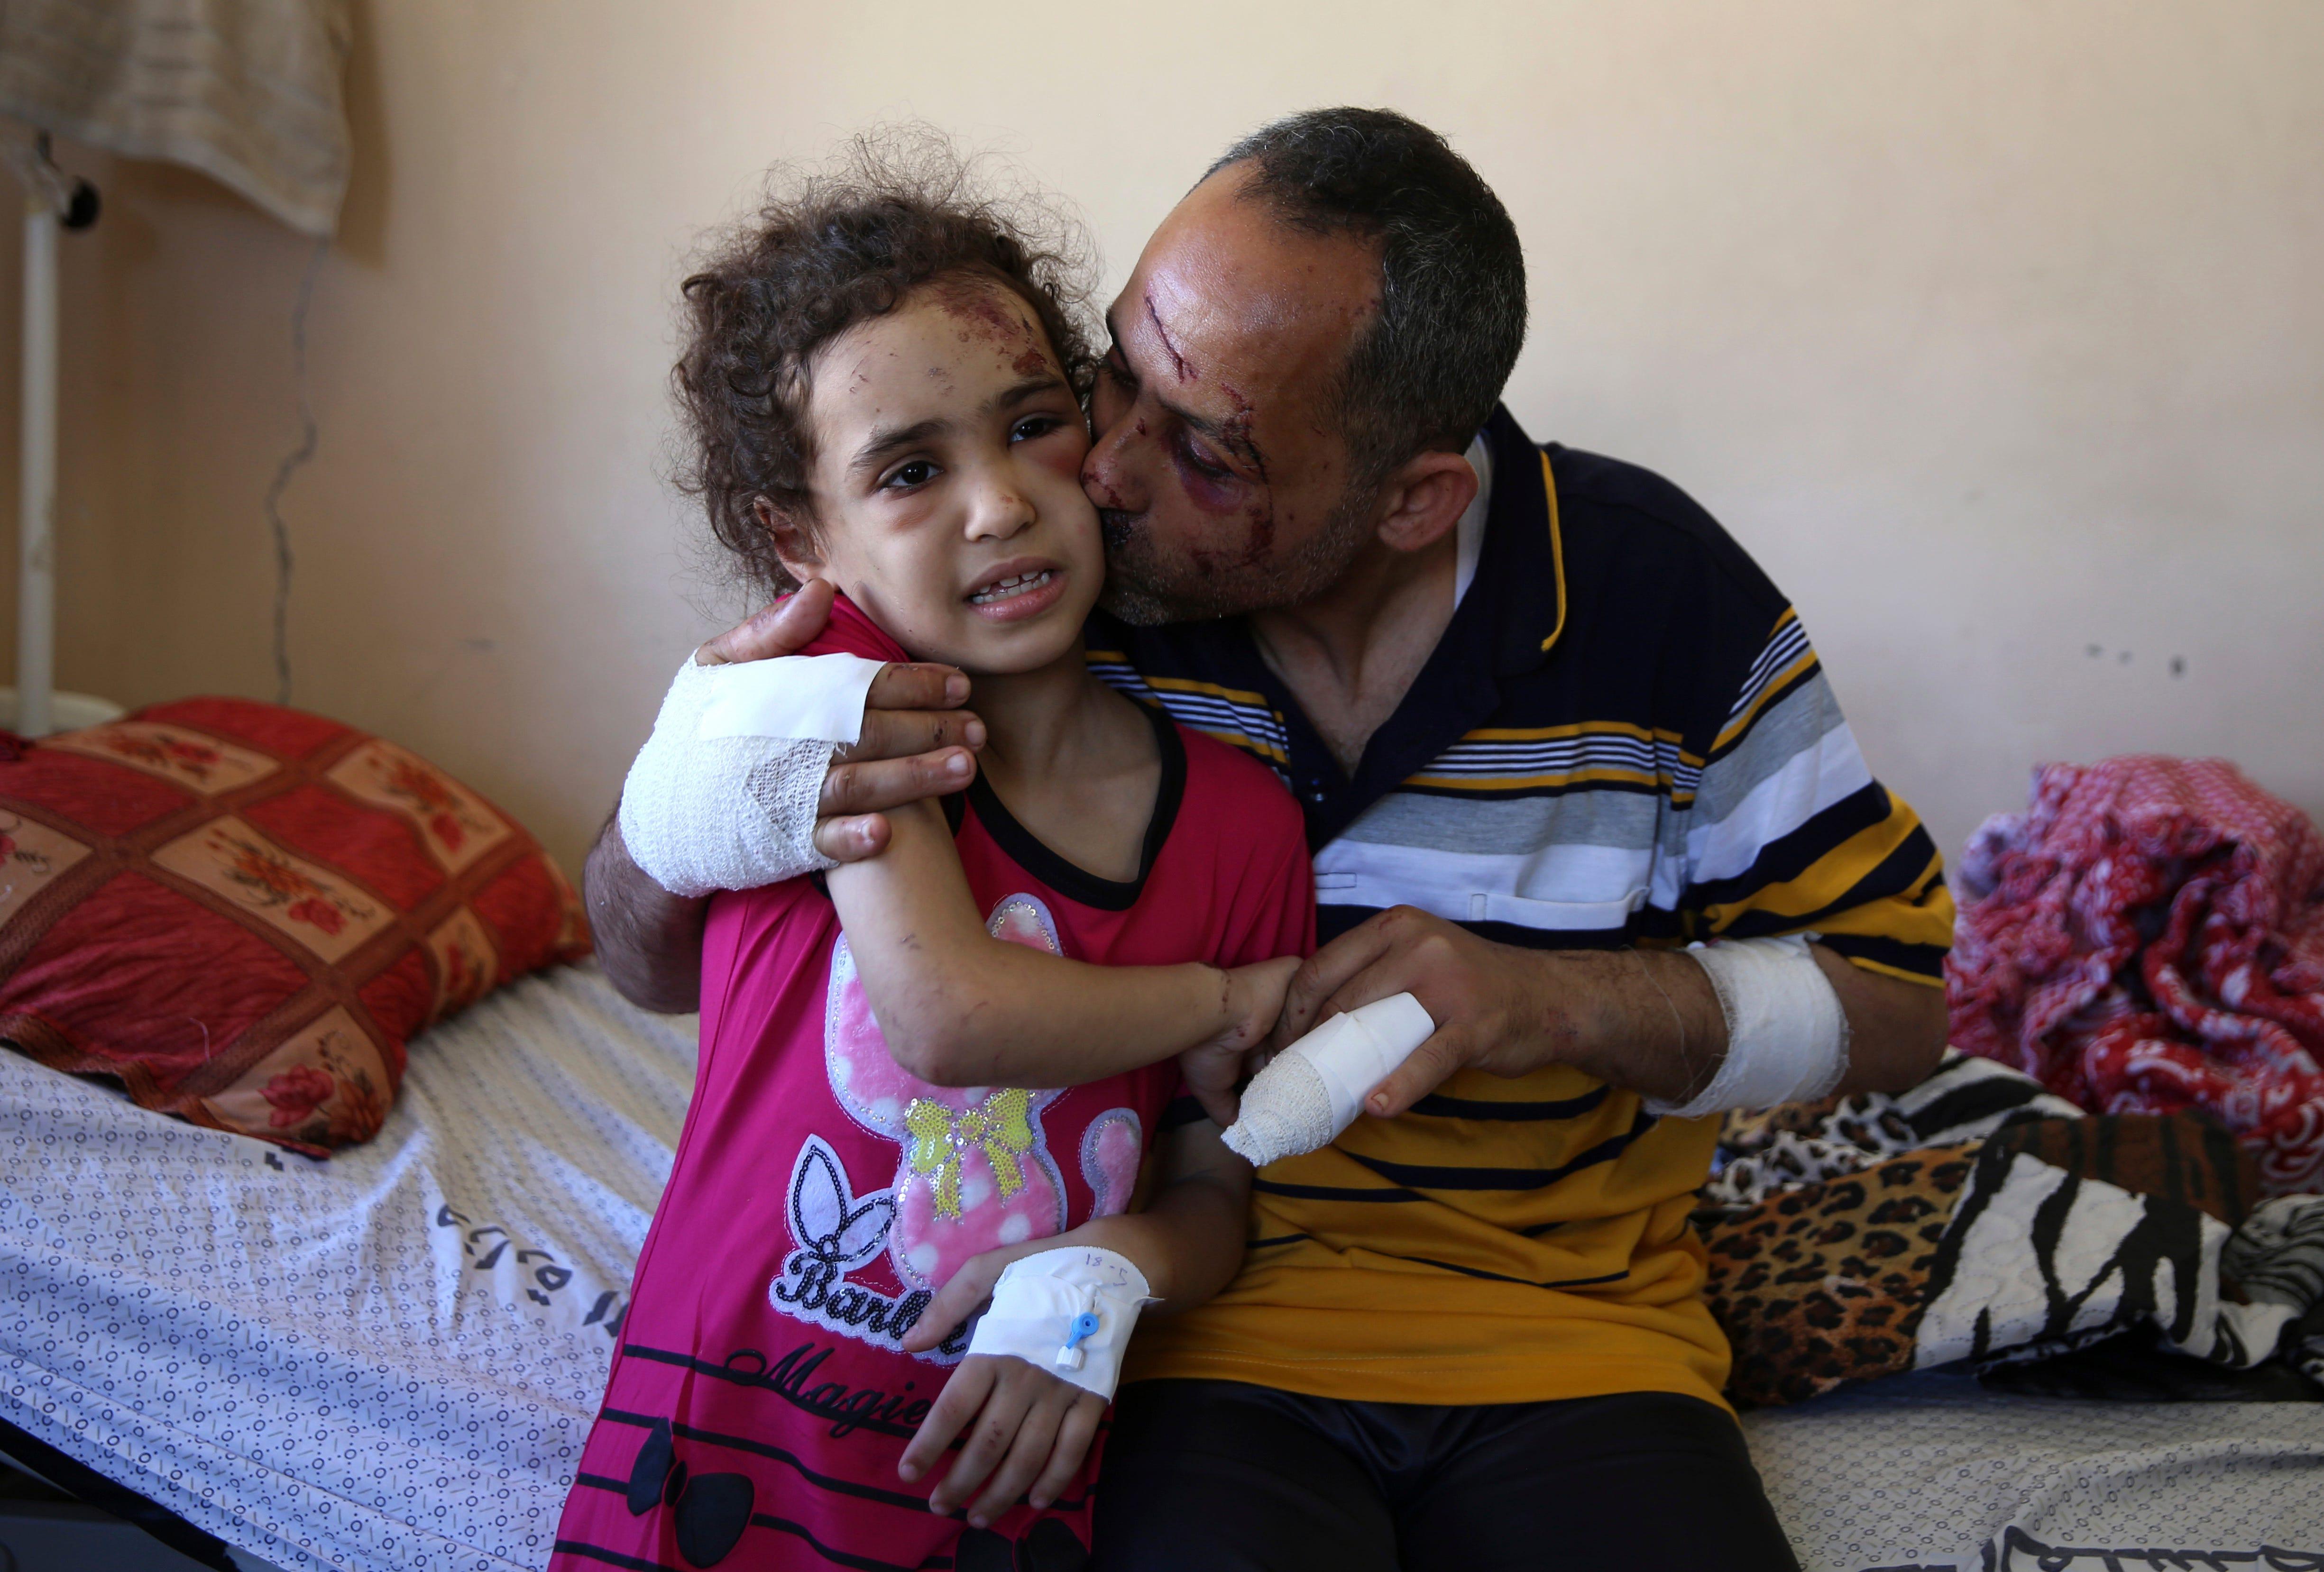 Gaza children bearing the brunt in Israel-Hamas conflict 2